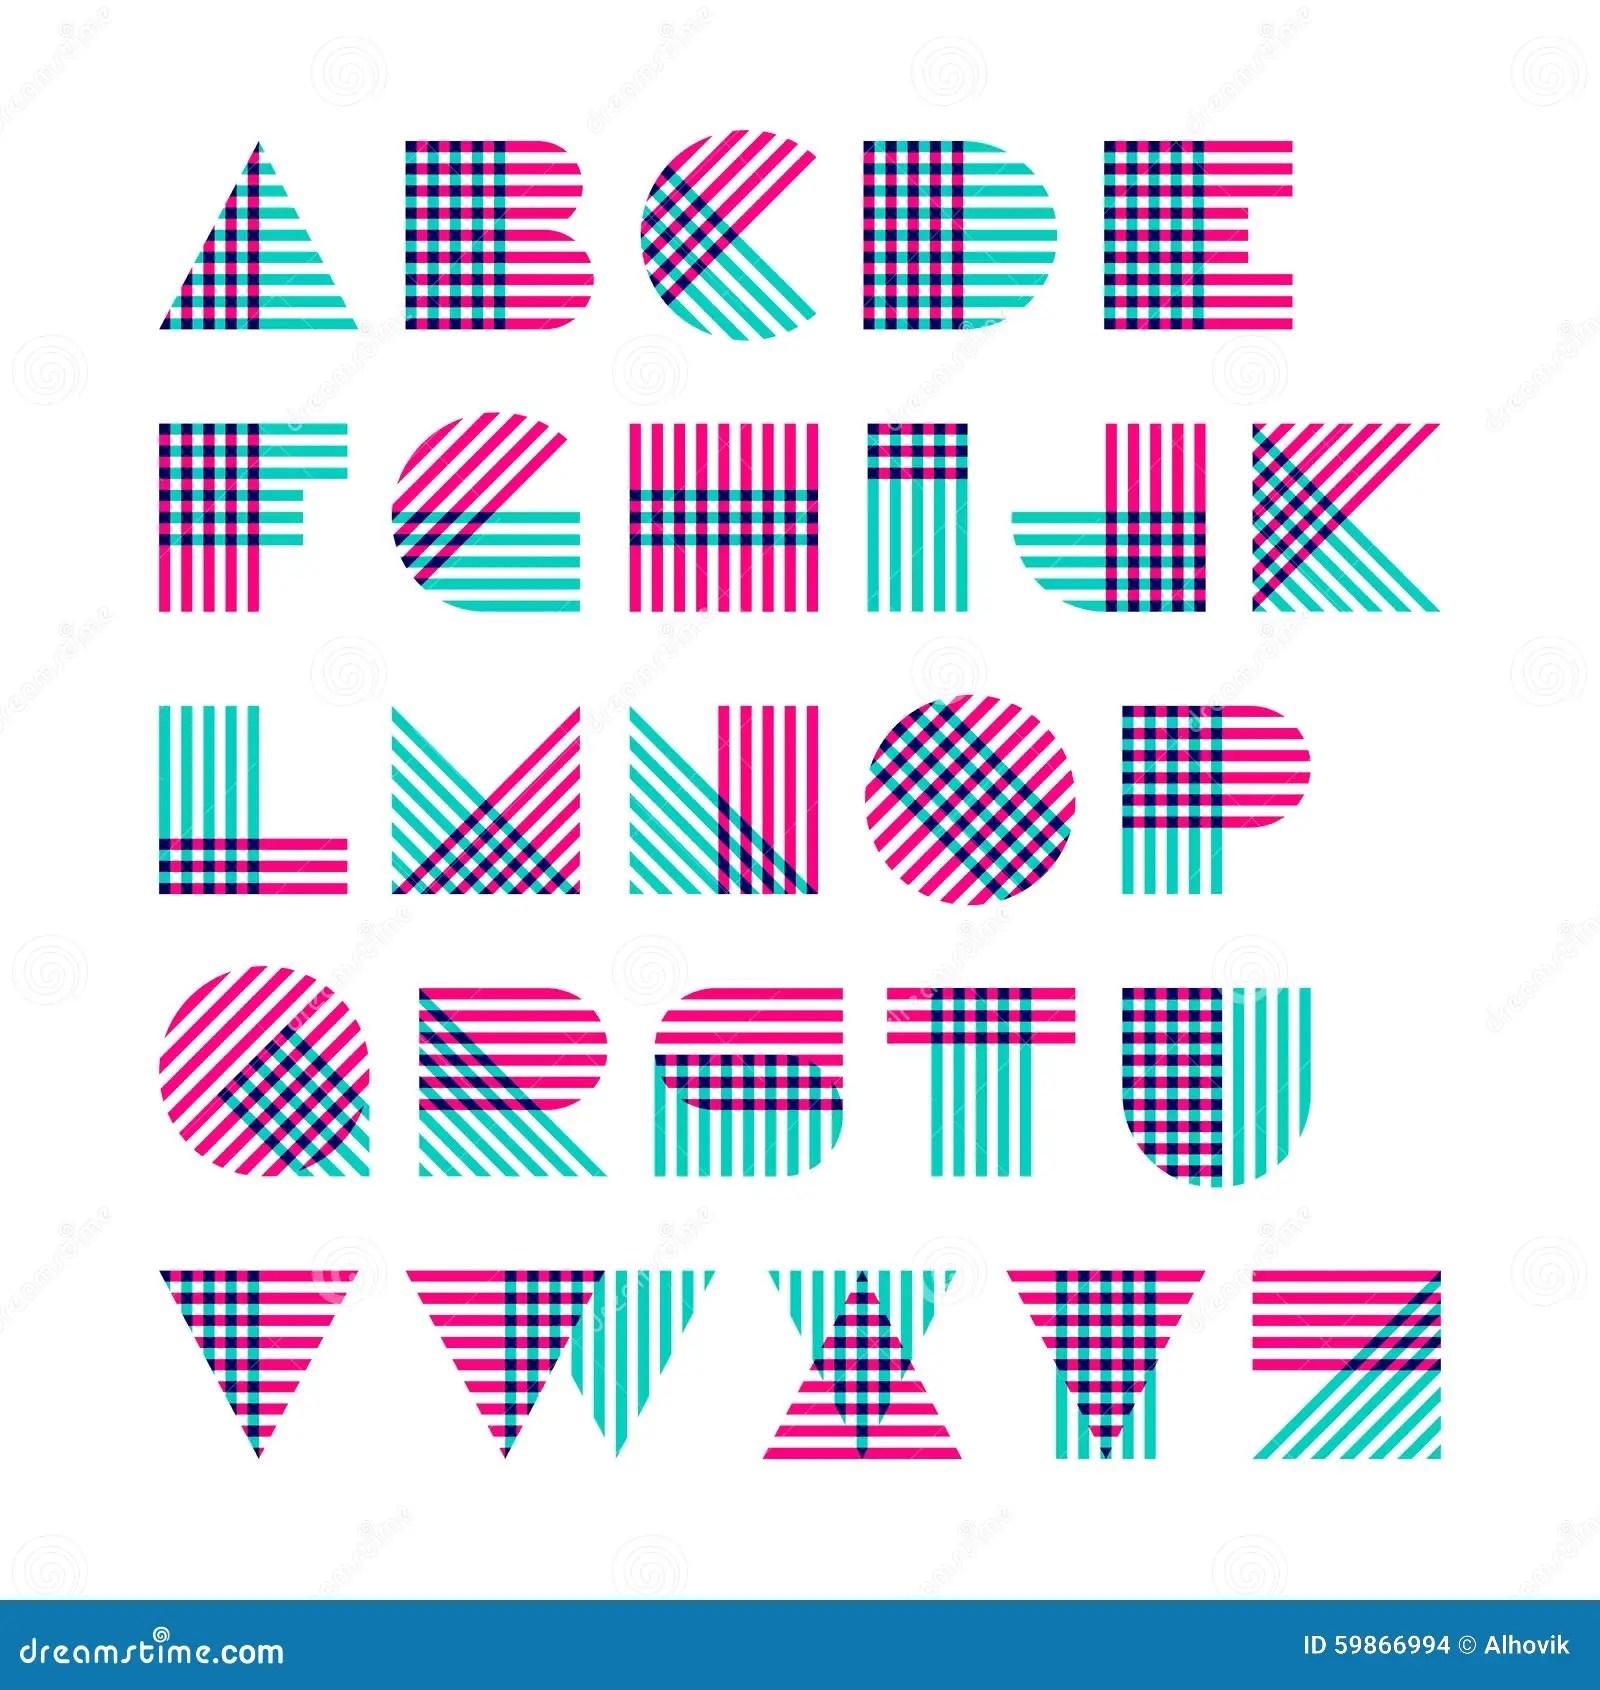 Geometric Shapes Alphabet Letters Cartoon Vector